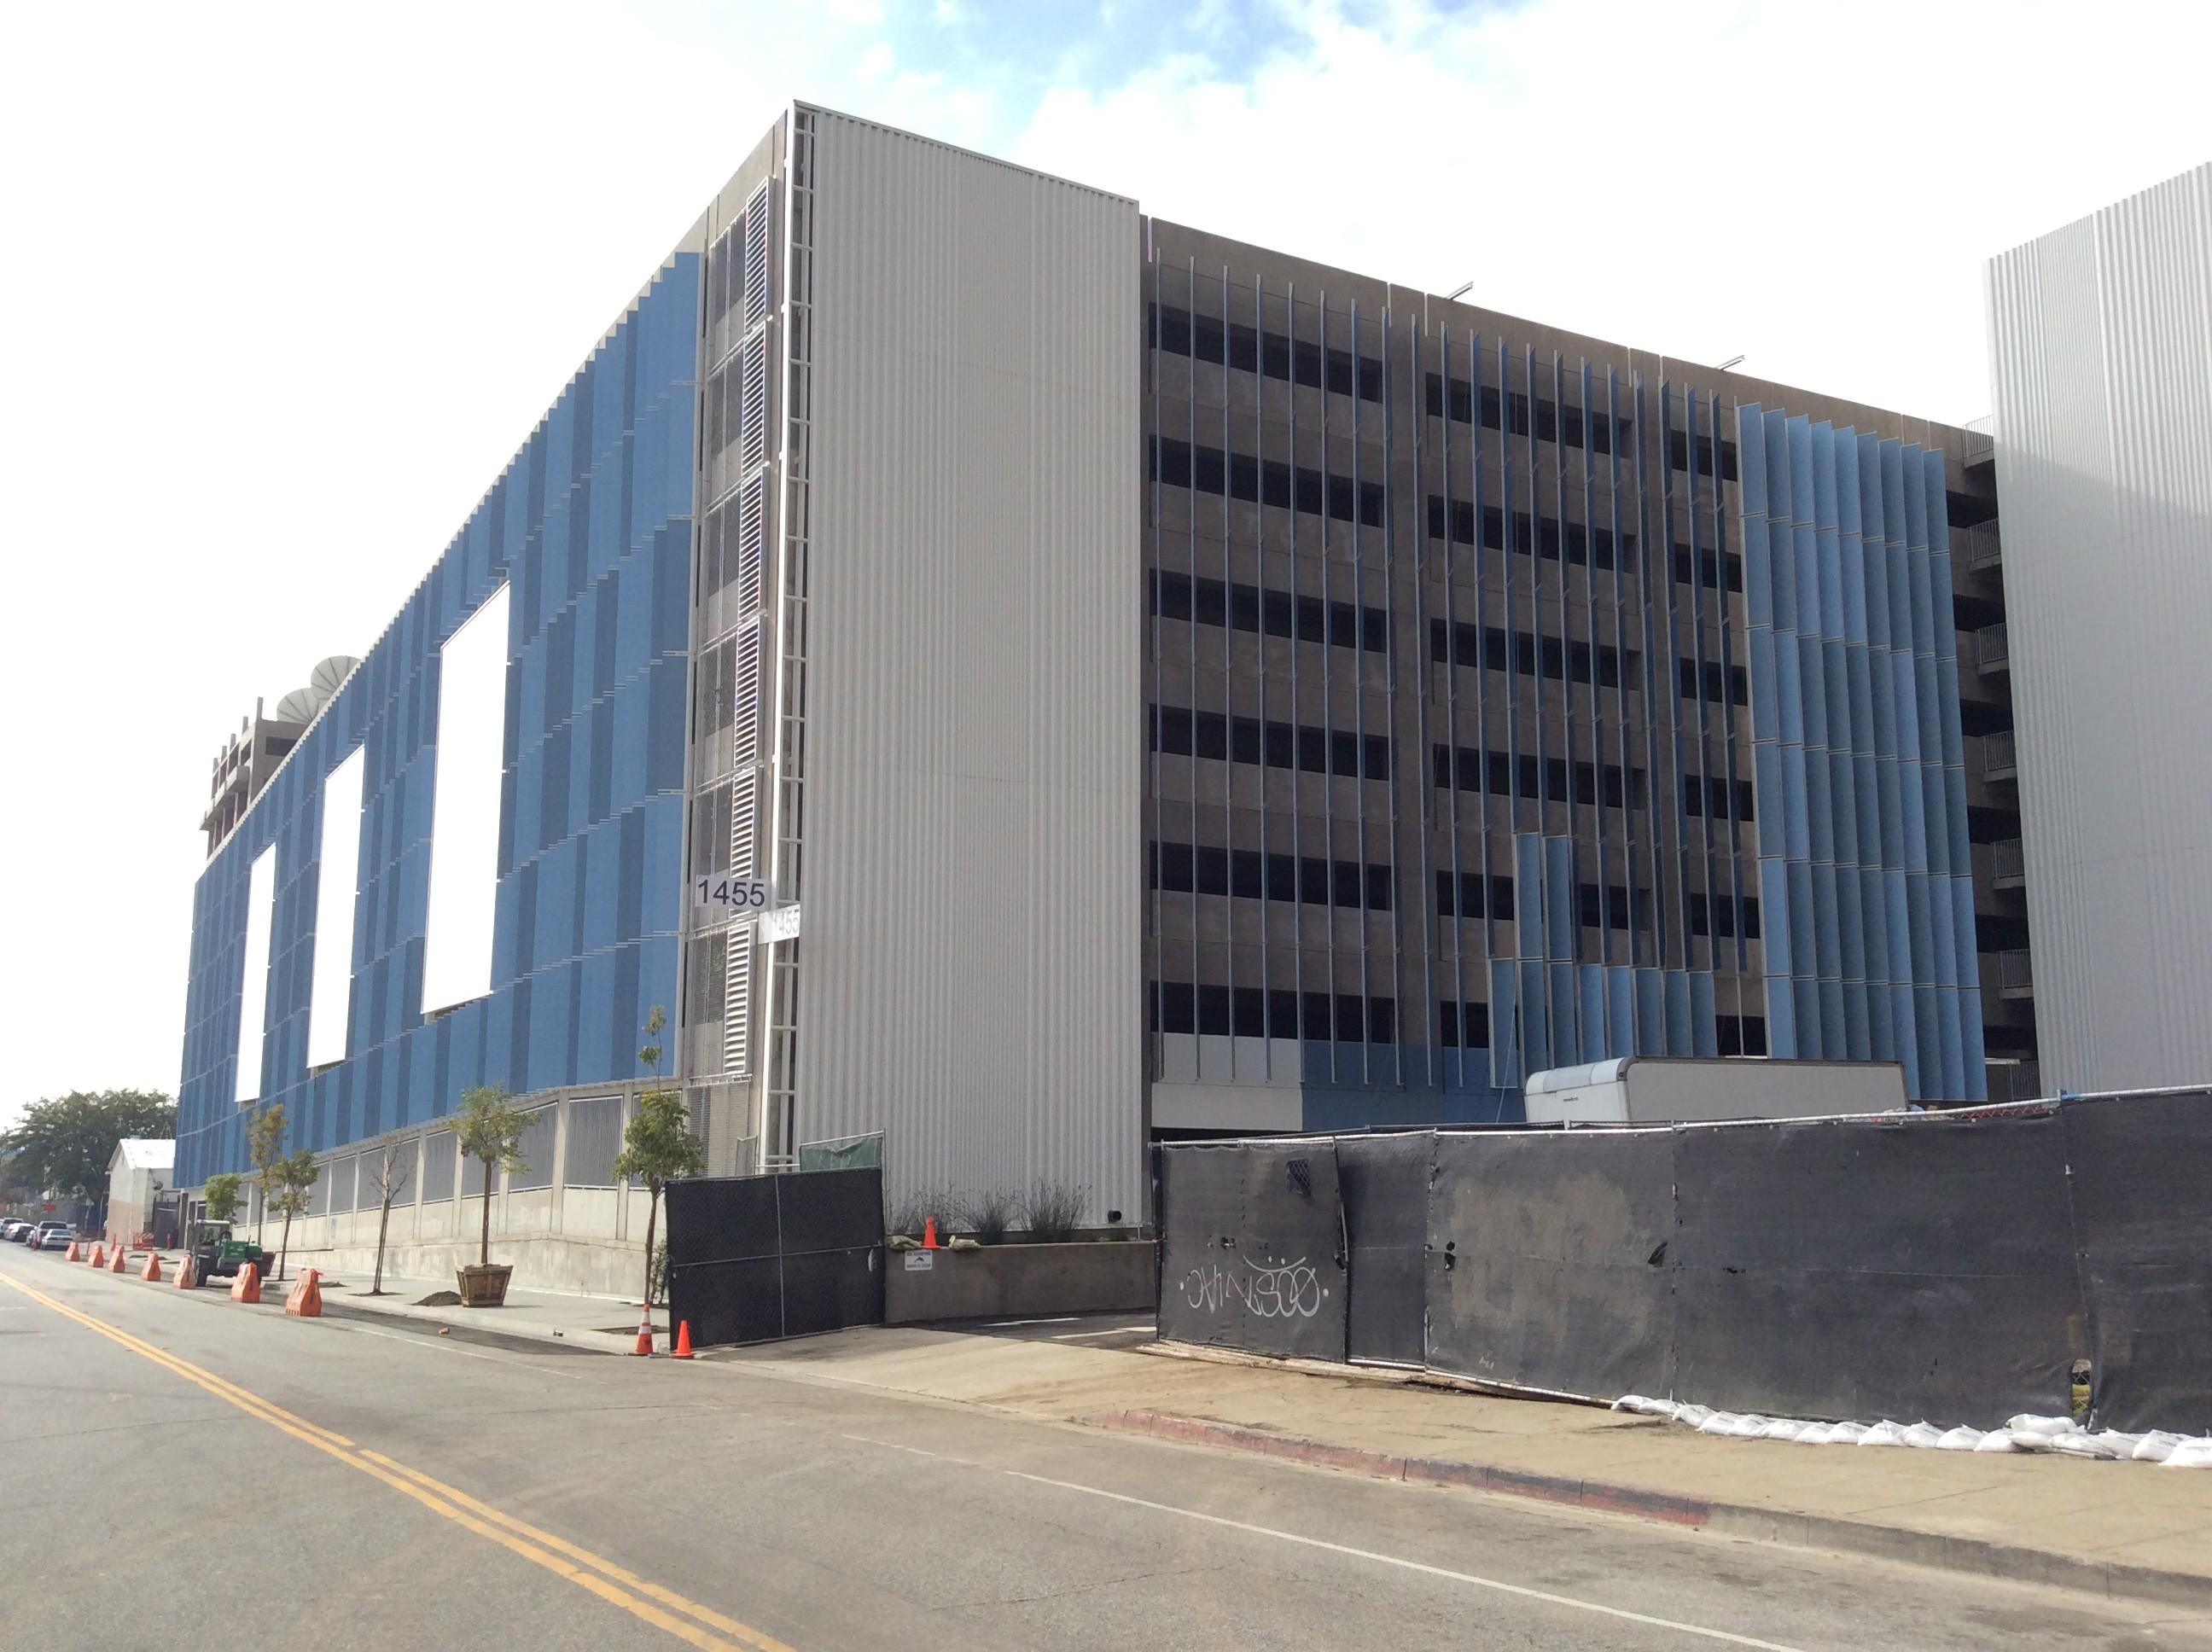 Sunset Bronson Studios Parking Structure